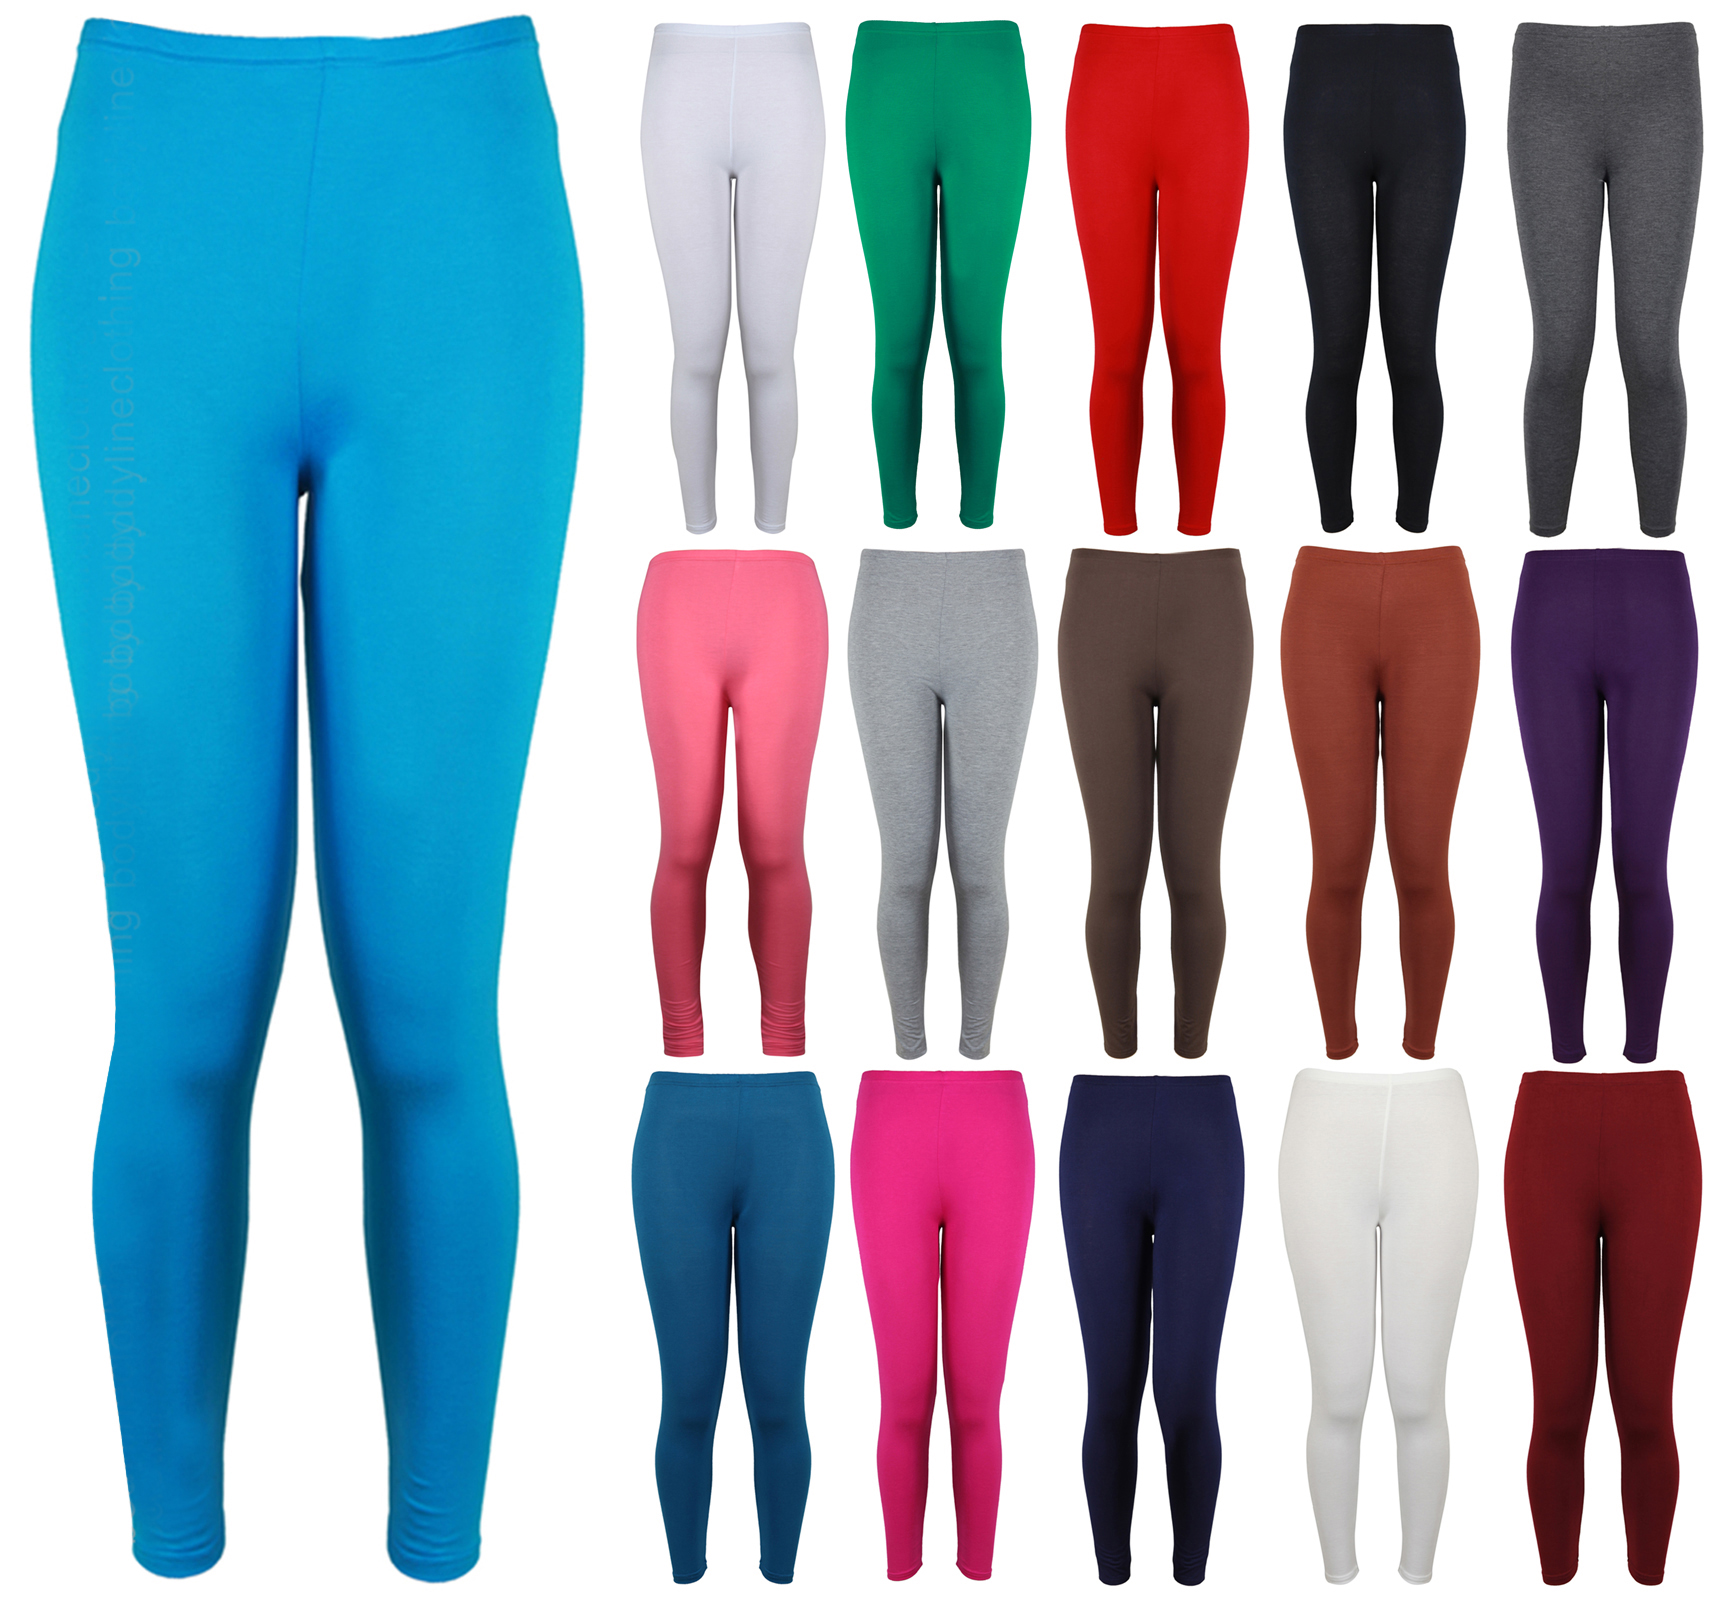 0afceb7434c0c Womens New Plain Stretch Ladies Full Long Trousers Pants Leggings ...